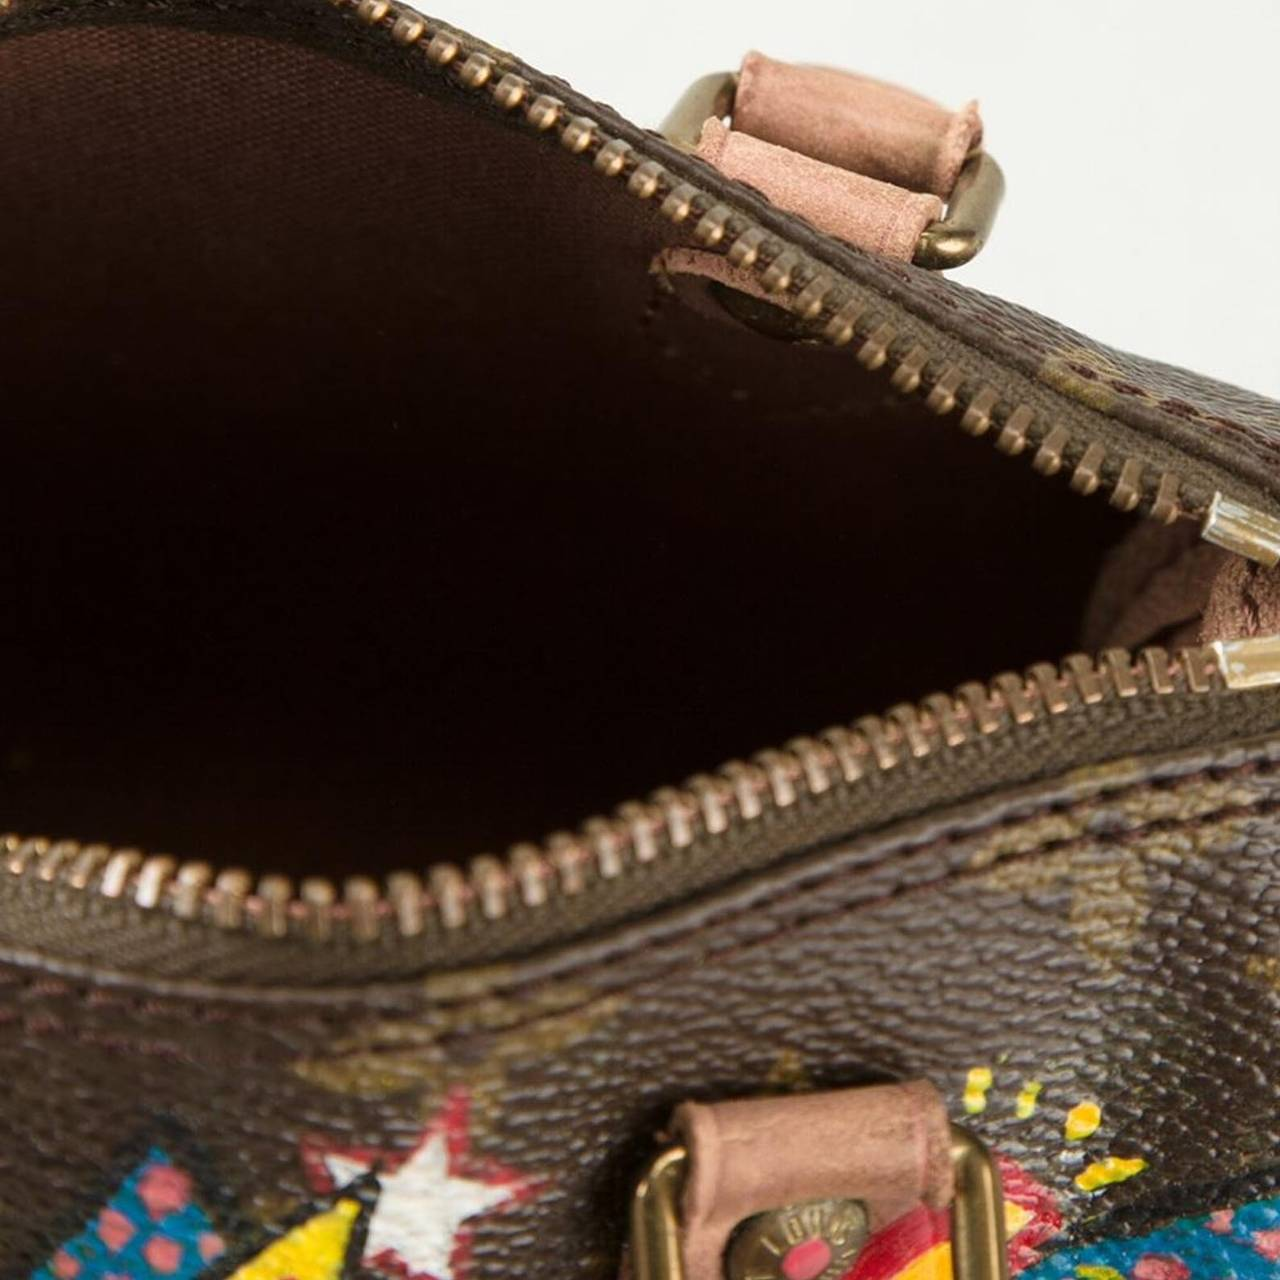 04e7e3717b75 Hand Painted Vintage Louis Vuitton Leather Monogram Mini Speedy bag. For  Sale 1